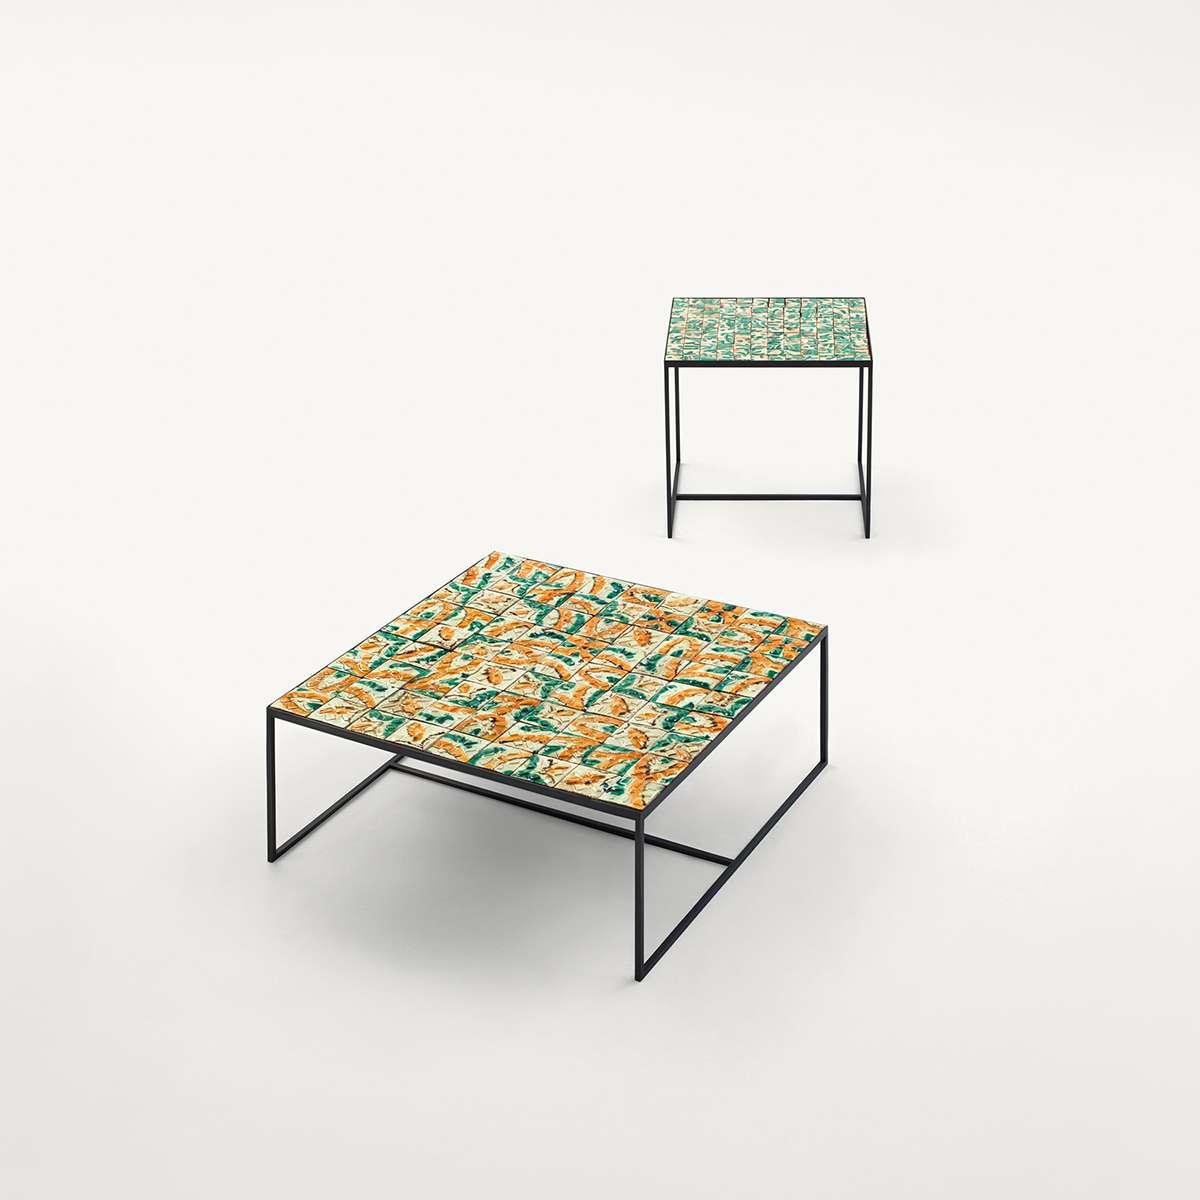 Cocci Low Tables